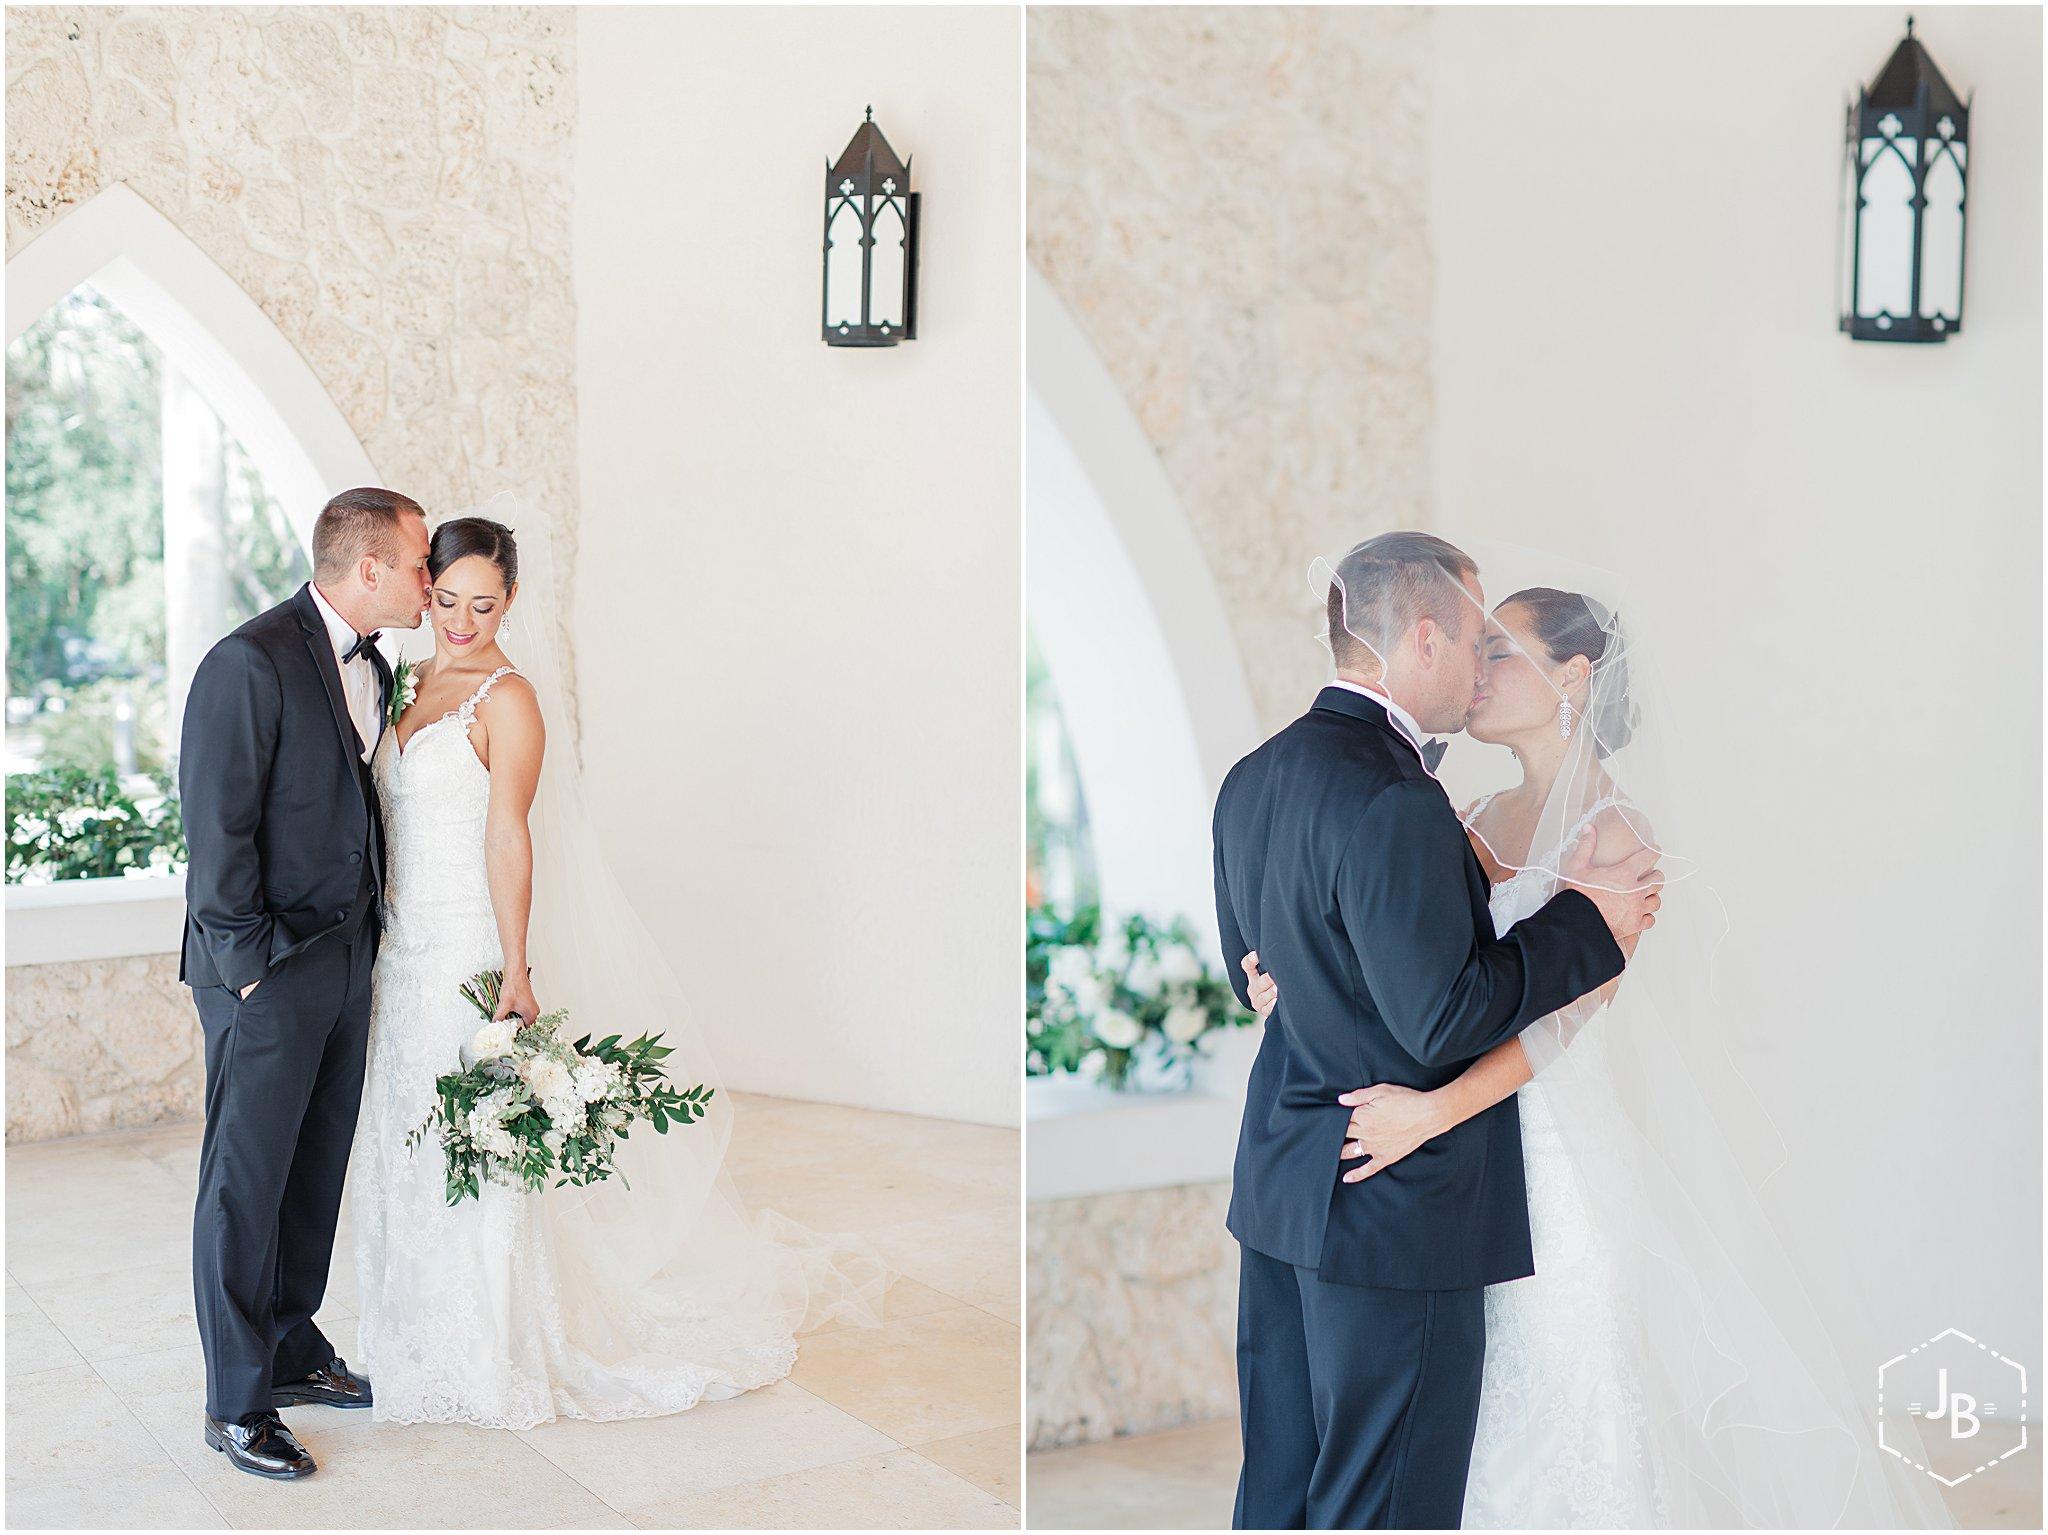 WeddingandEngagementFloridaPhotographer_0222.jpg